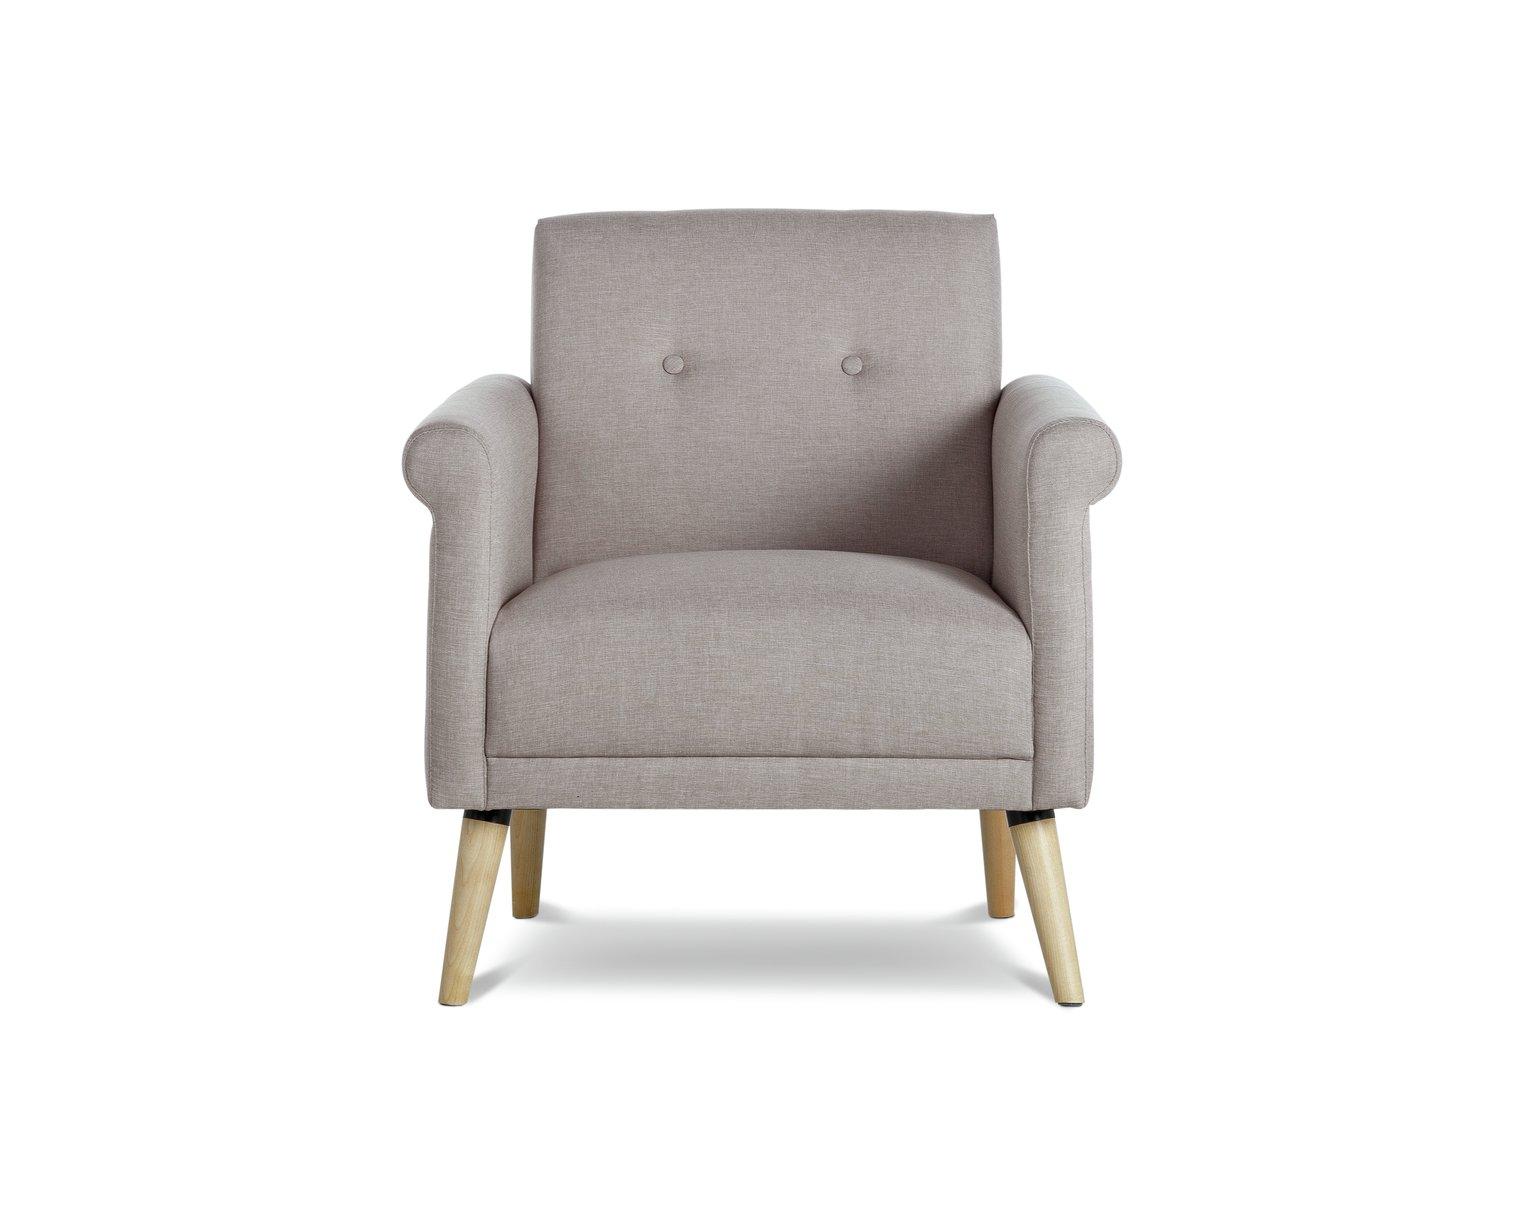 Argos Home Evie Fabric Armchair in a Box - Natural